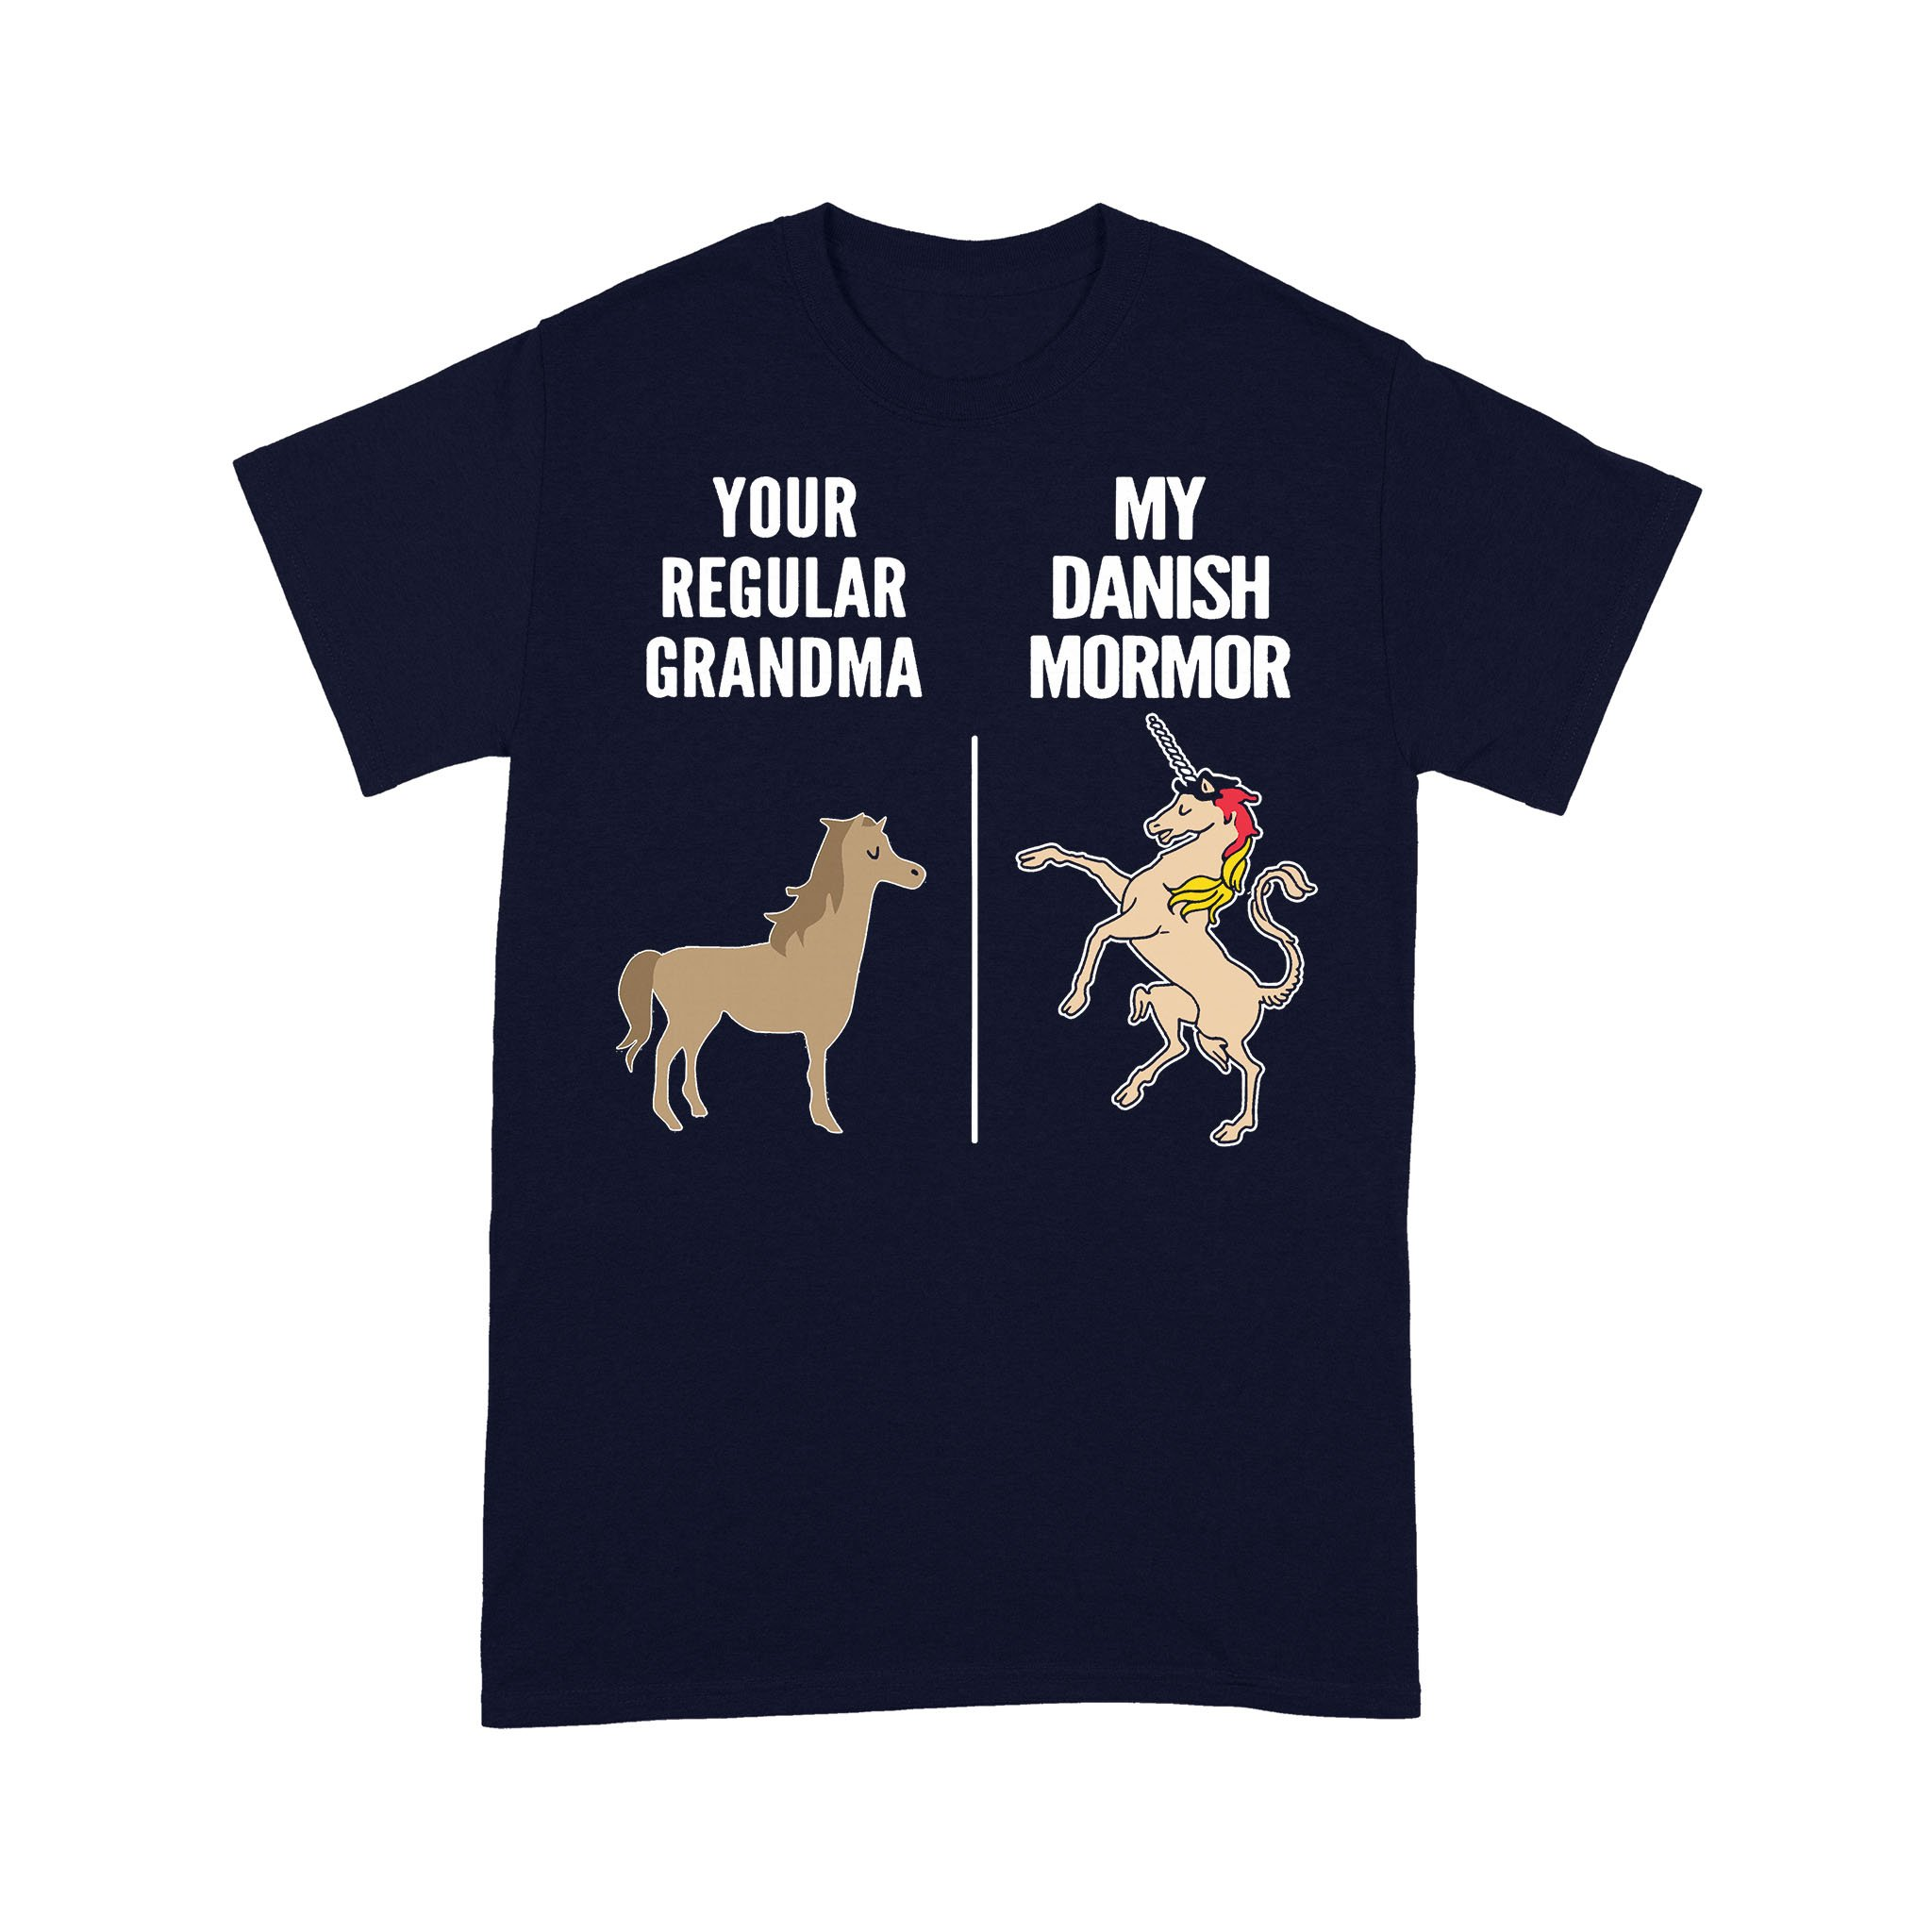 Horse Your Regular Grandma My Danish Mormor T-shirt